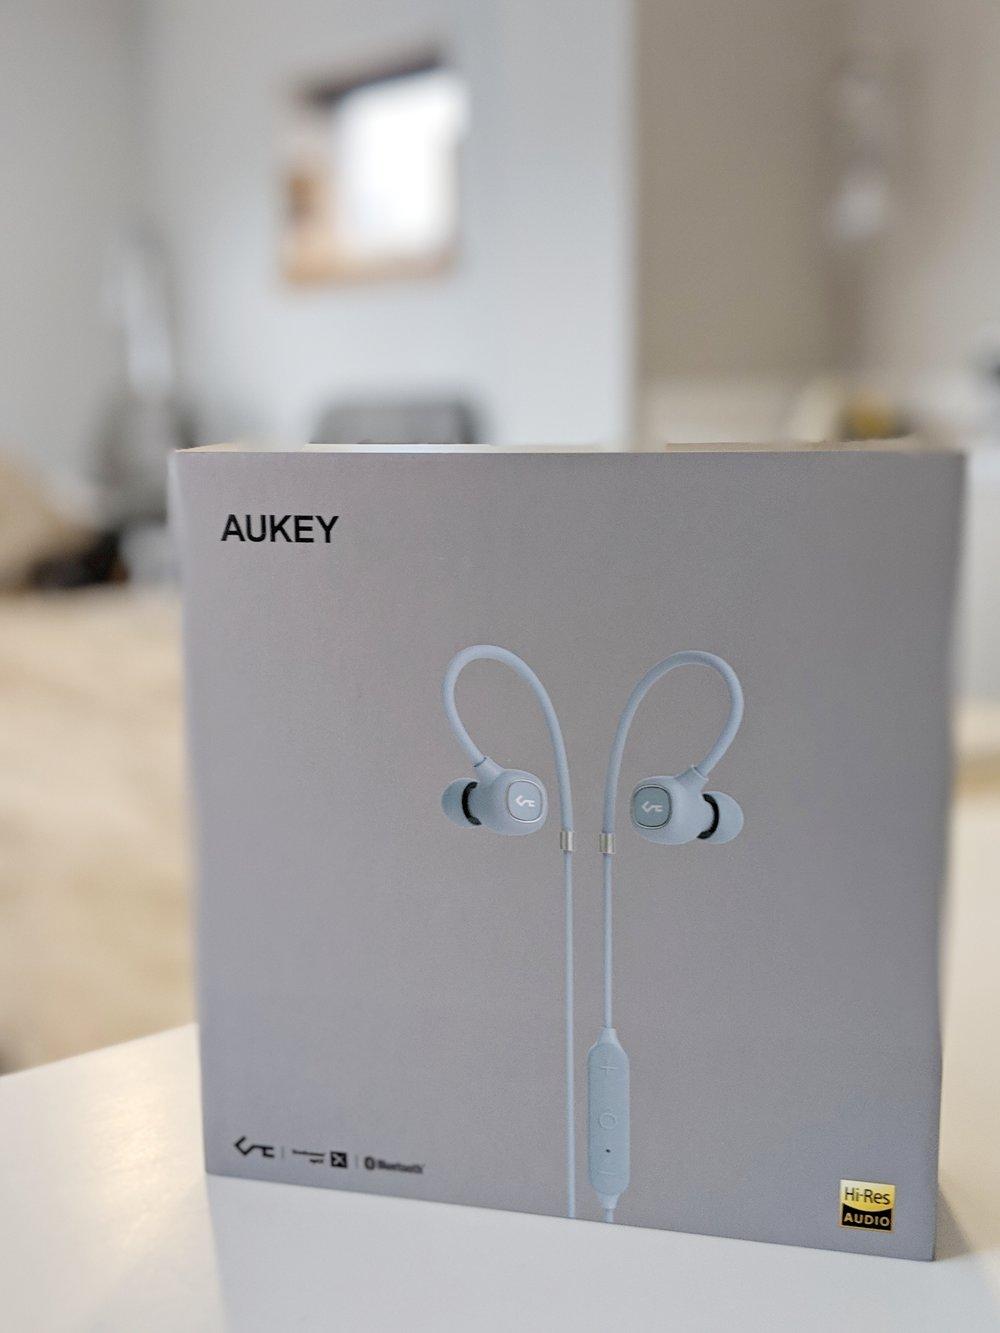 Aukey Key Series B80 Bluetooth earphone box review